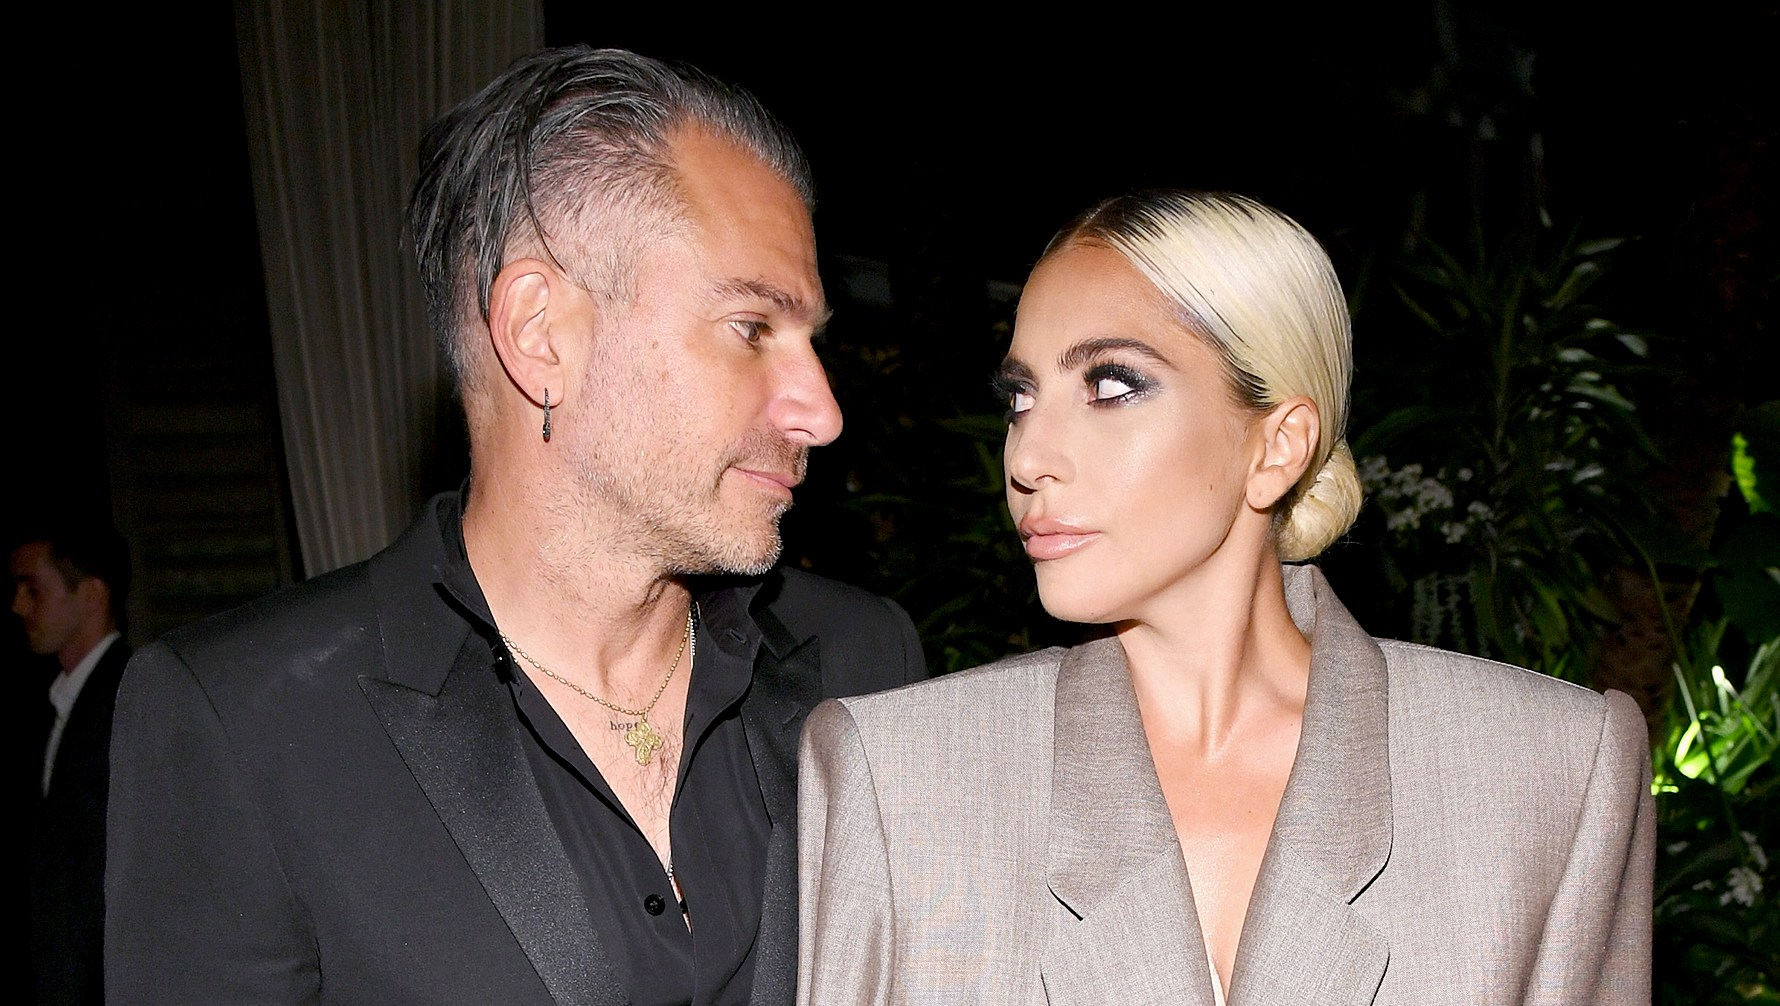 Lady-Gaga-and-Christian-Carino